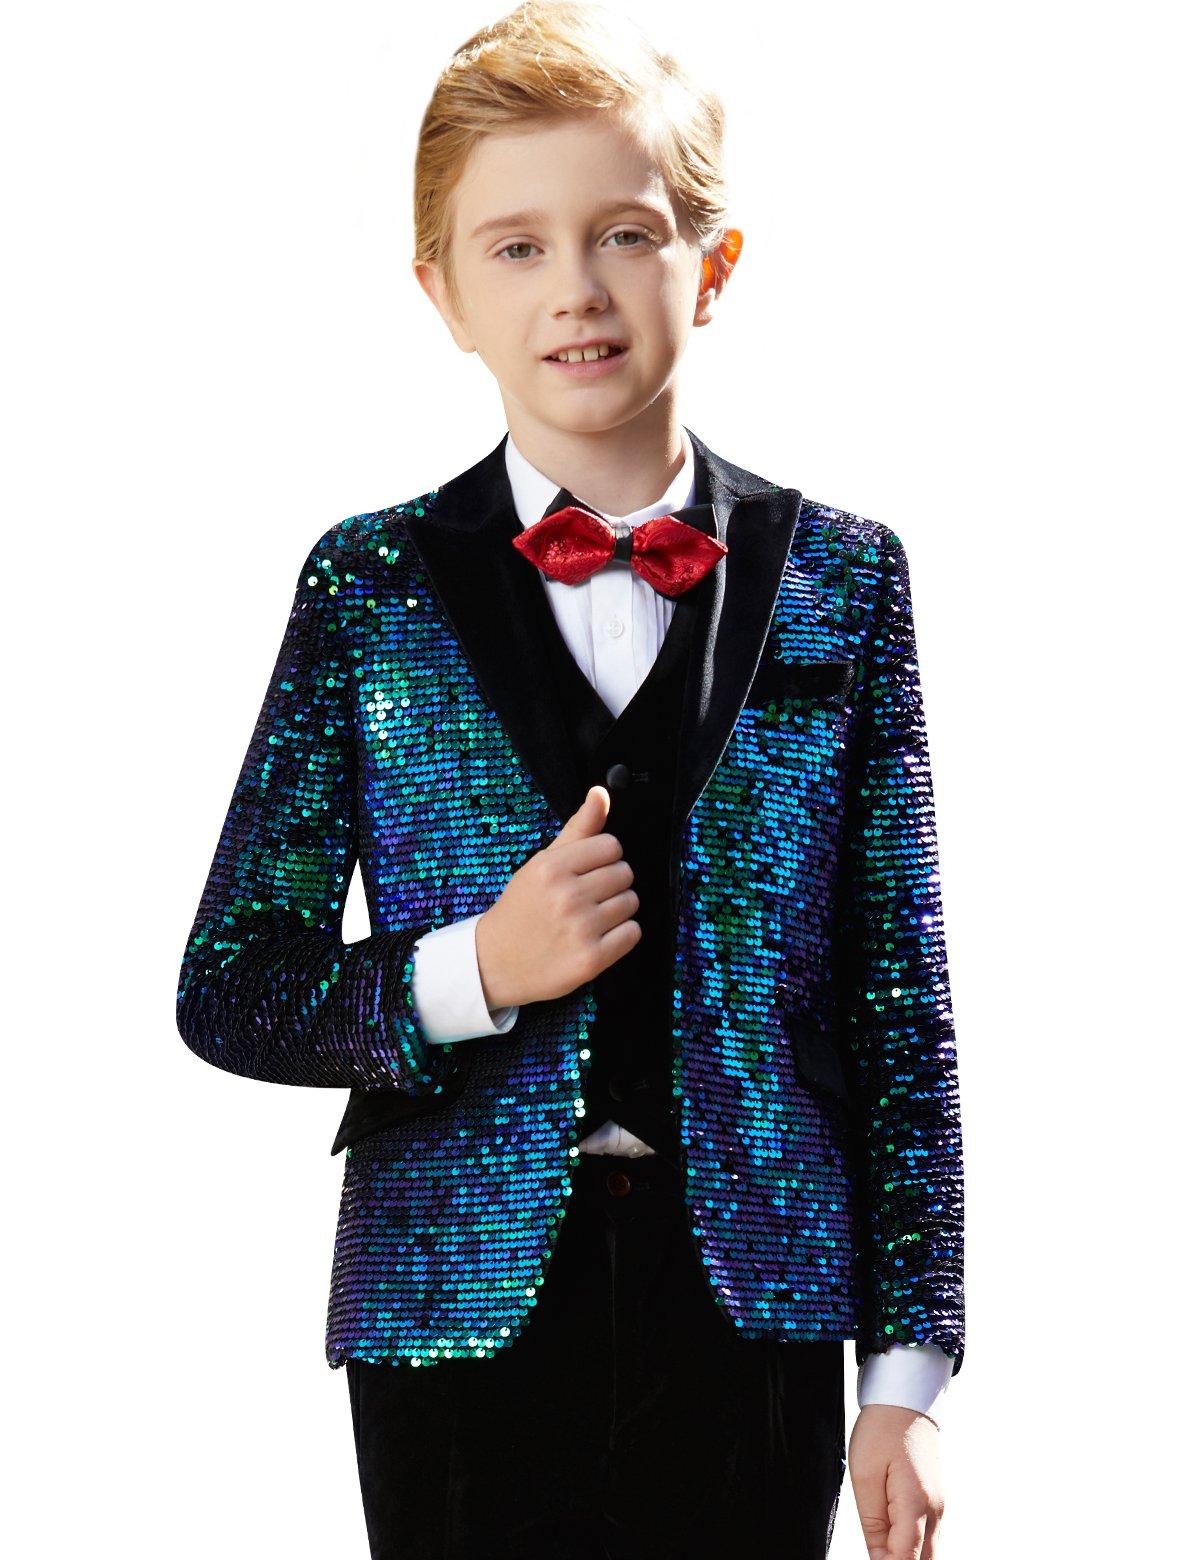 ELPA ELPA Boys Suits 5 Set Children's Dresses Slim Fit Formal Wedding Primary School Host Piano Performance Clothes